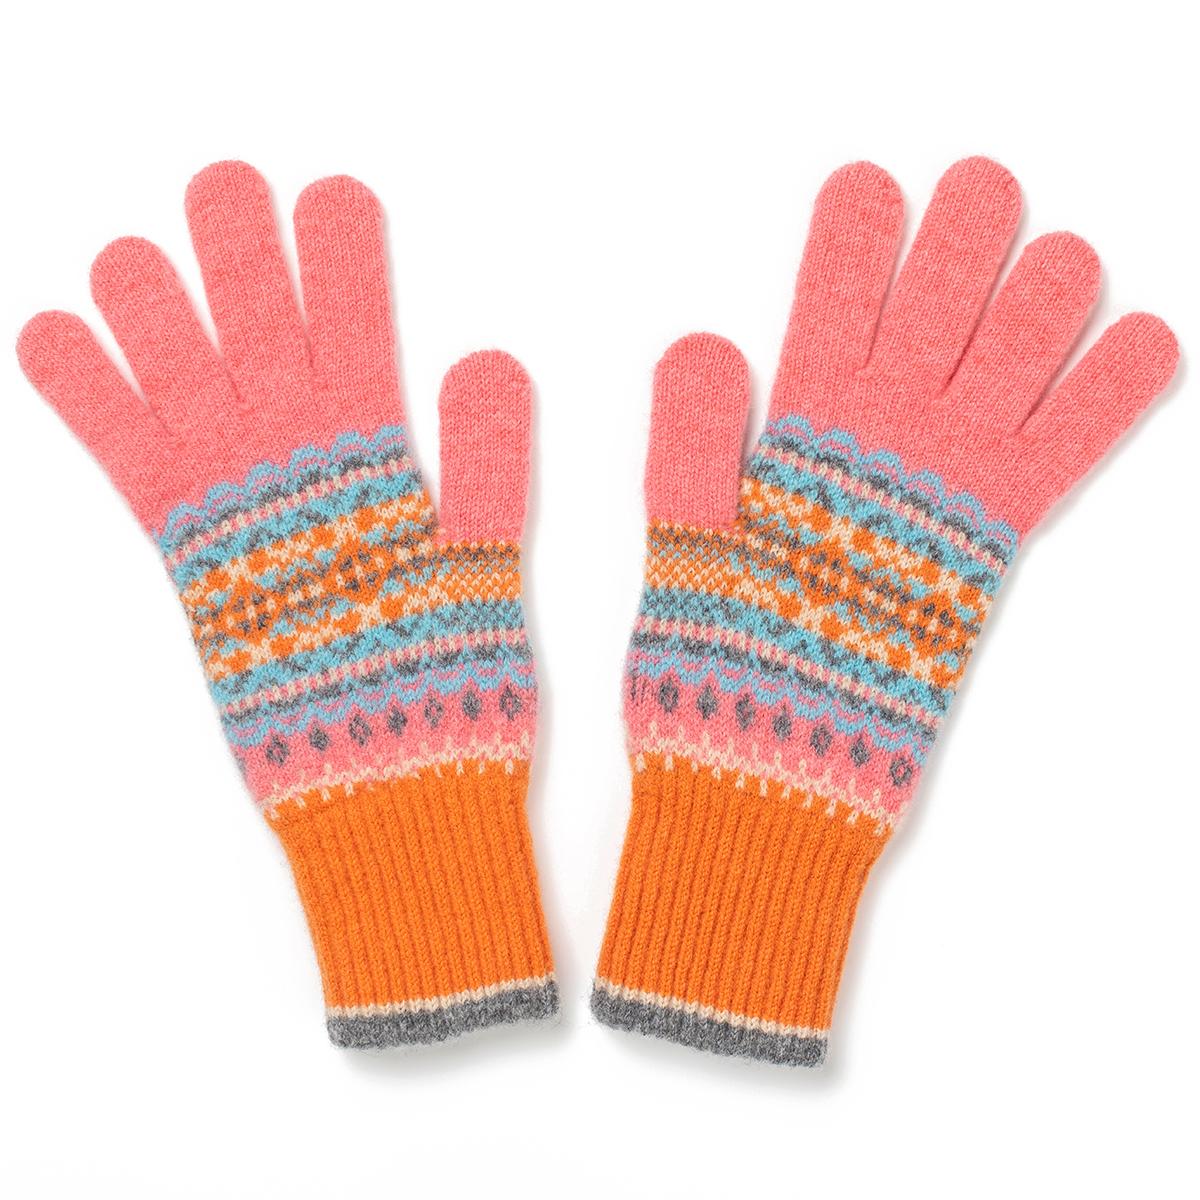 Alloa floral spice gloves